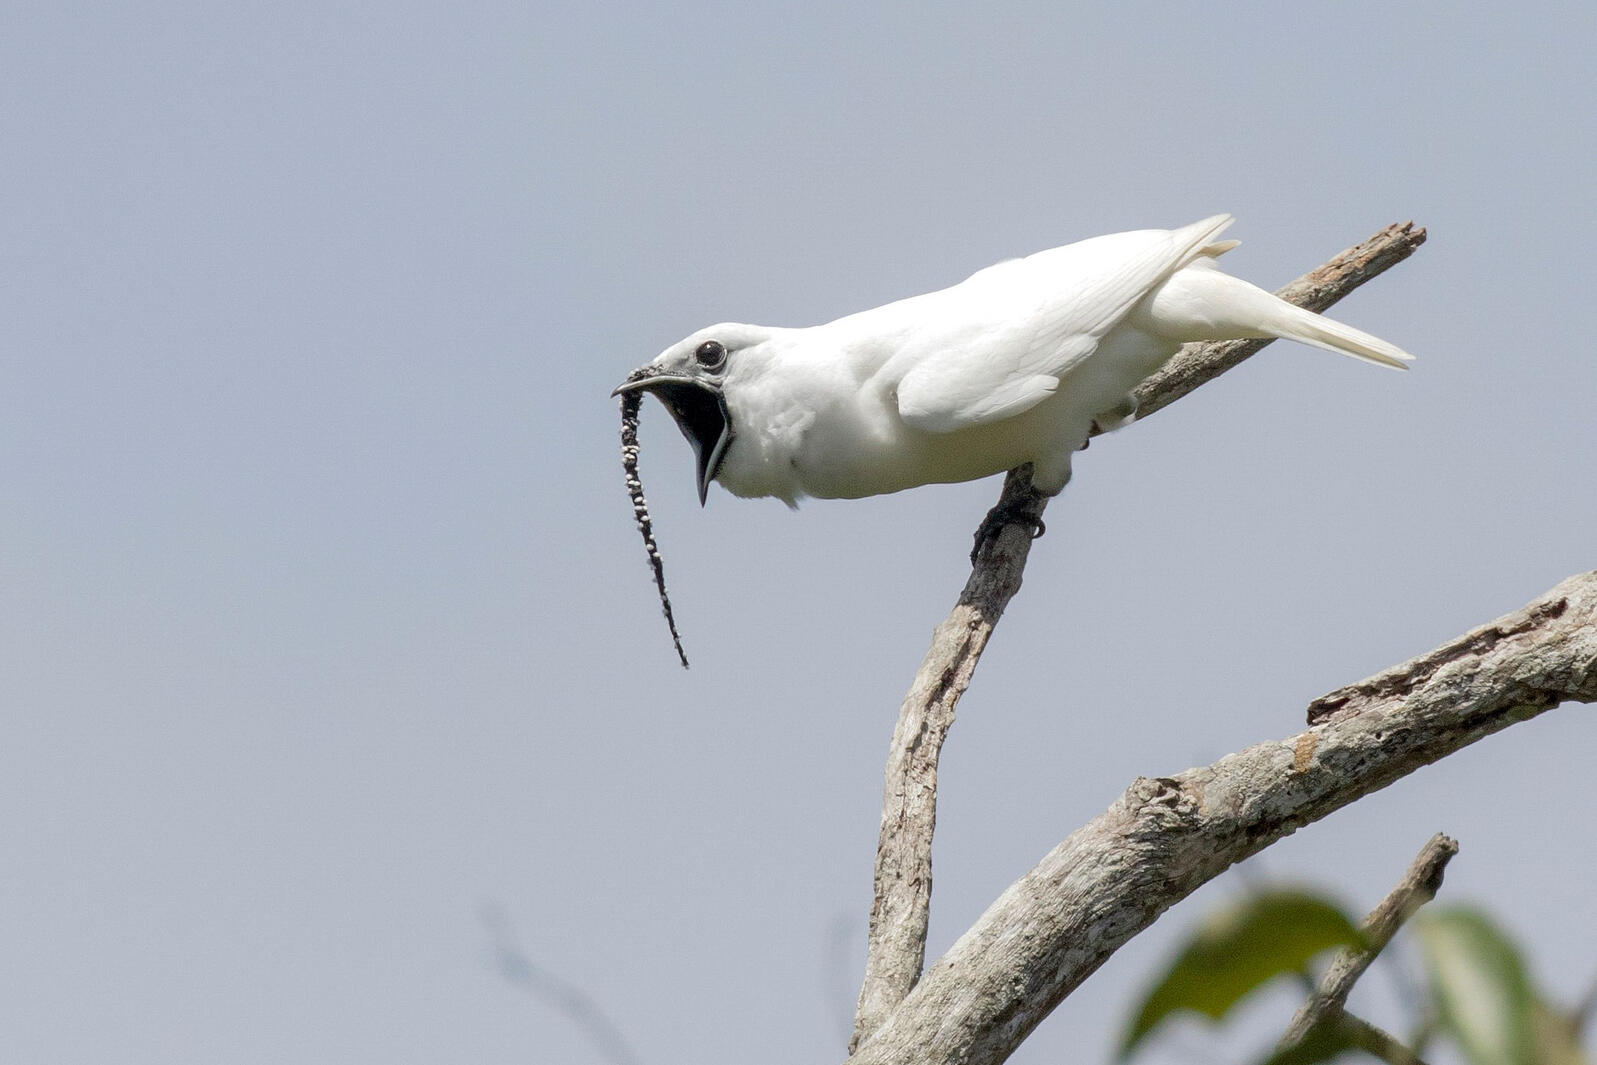 Male White Bellbird screaming mating call. Anselmo d'Affonseca